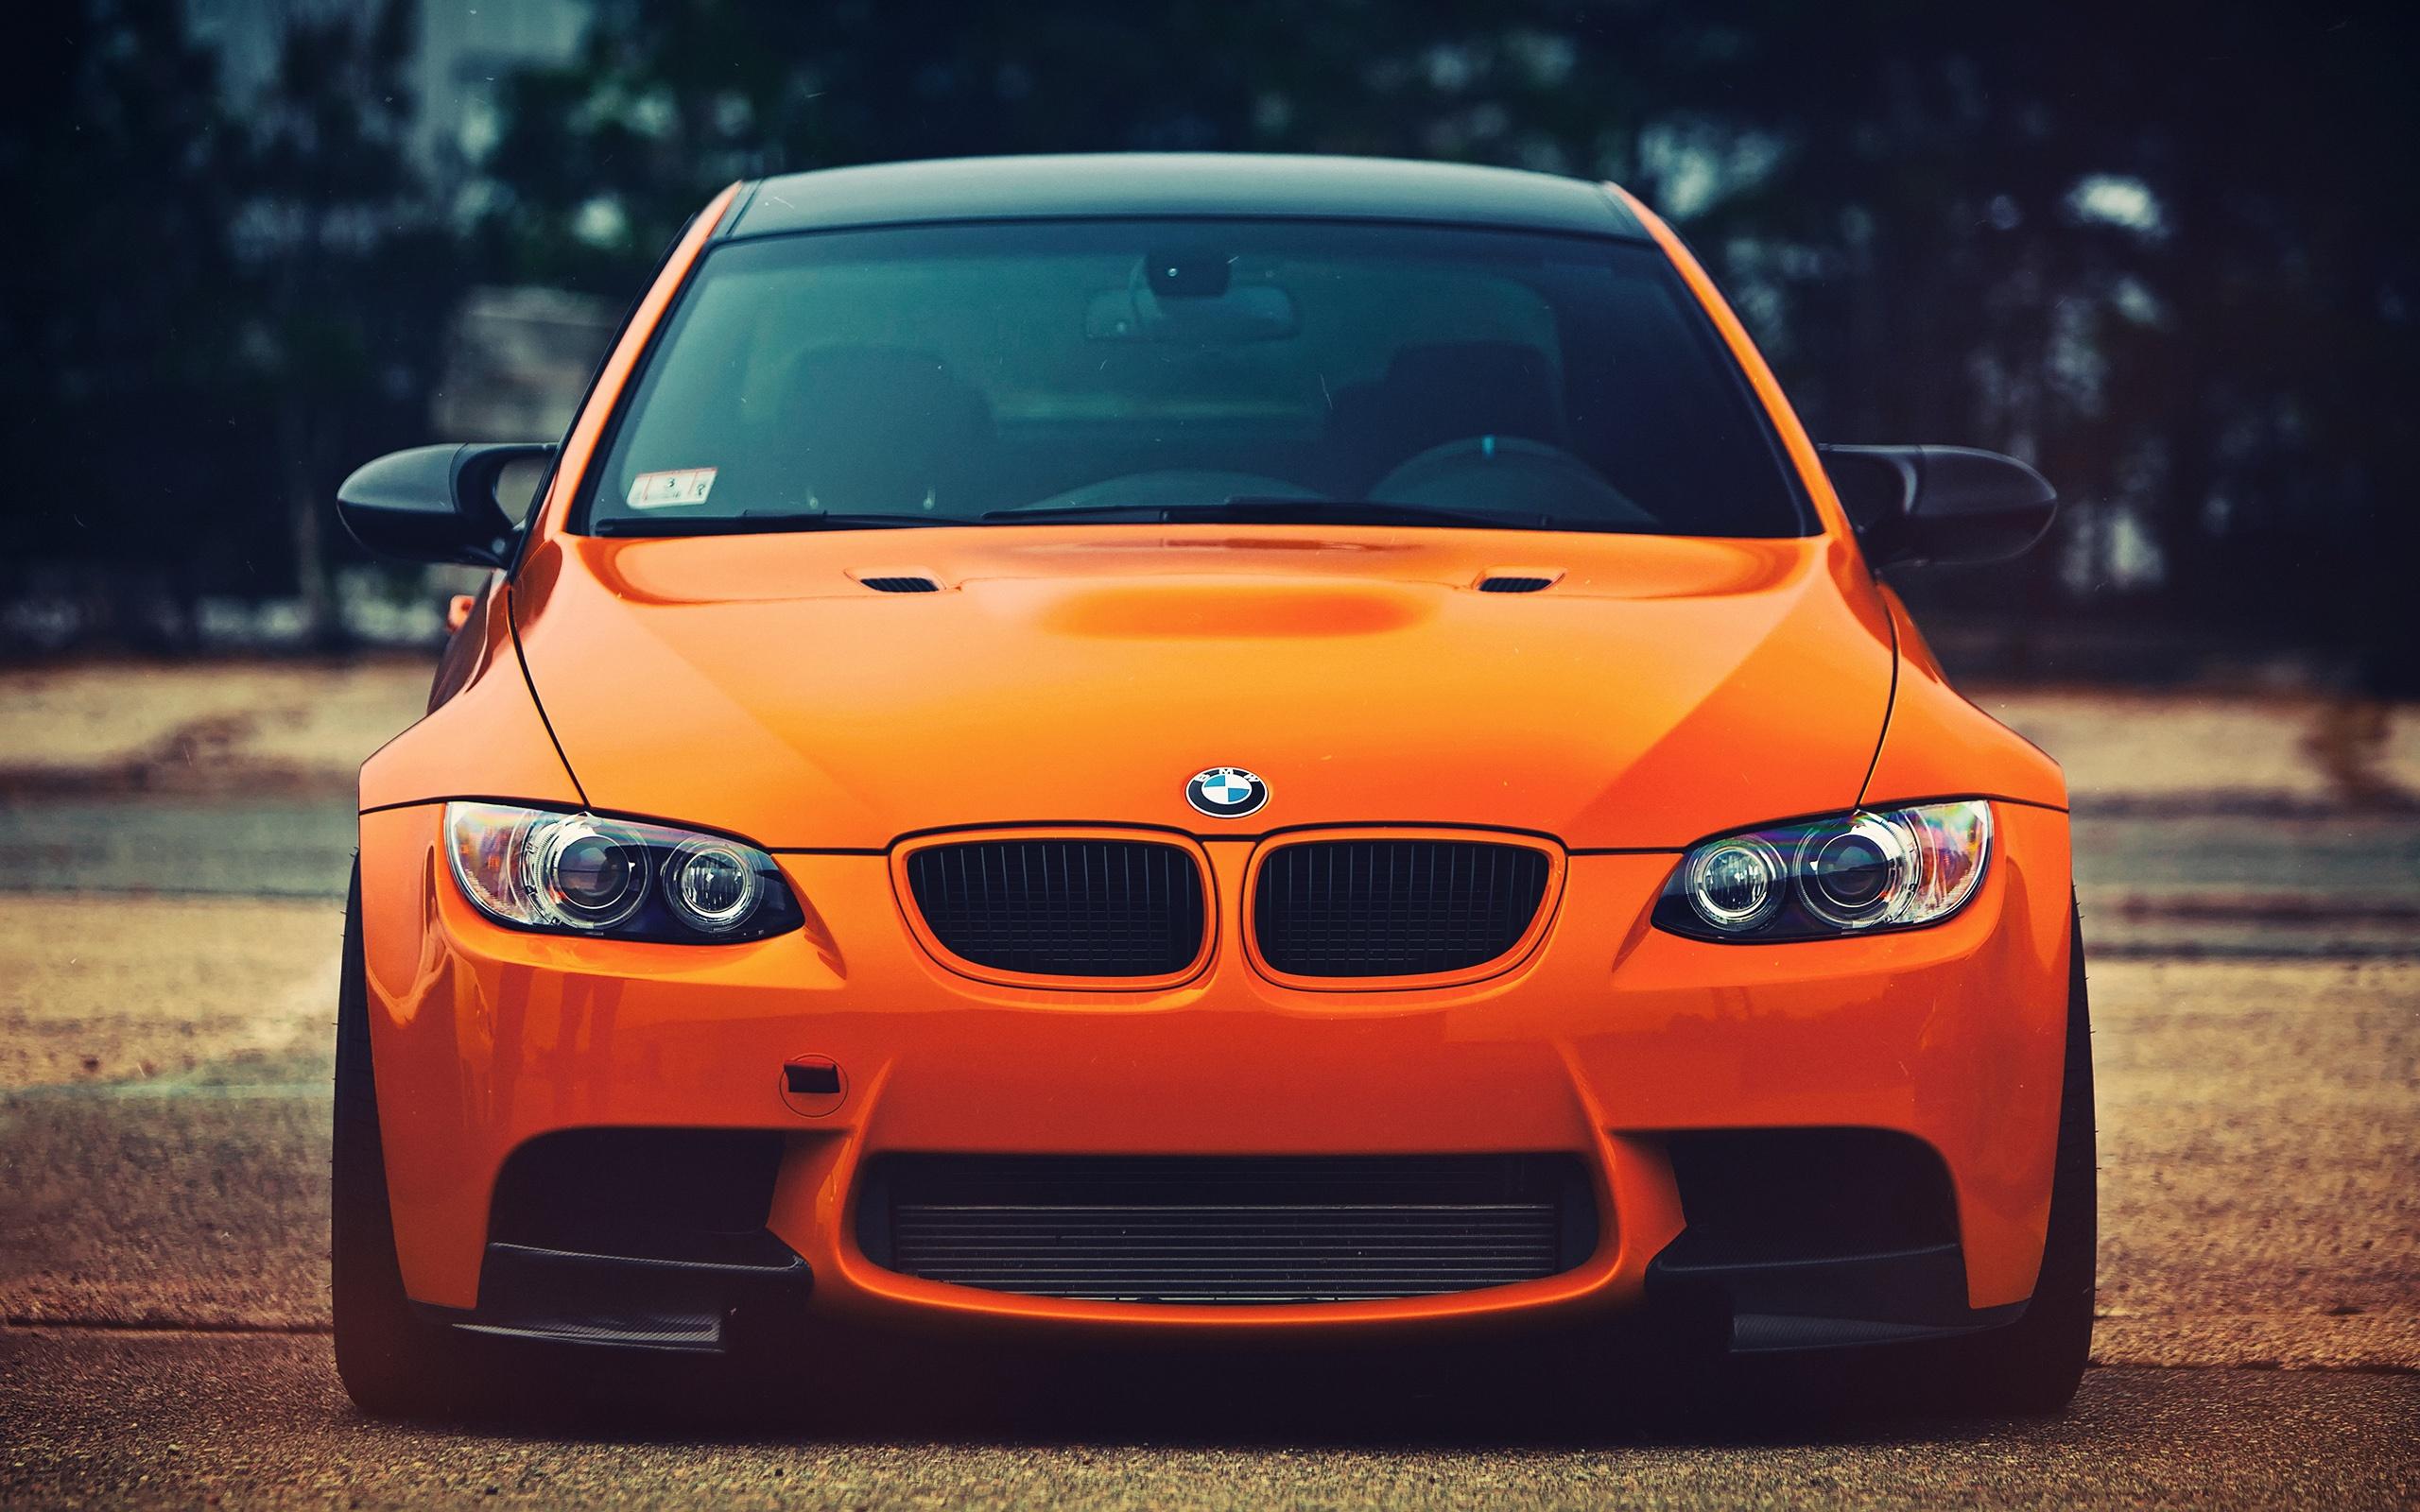 Wallpaper Bmw M3 Orange Car Front View 2560x1600 Hd Picture Image